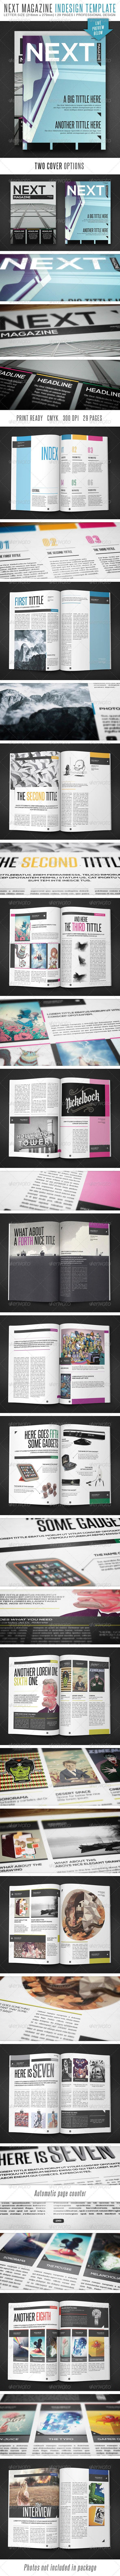 Next MGZ Template - Magazines Print Templates